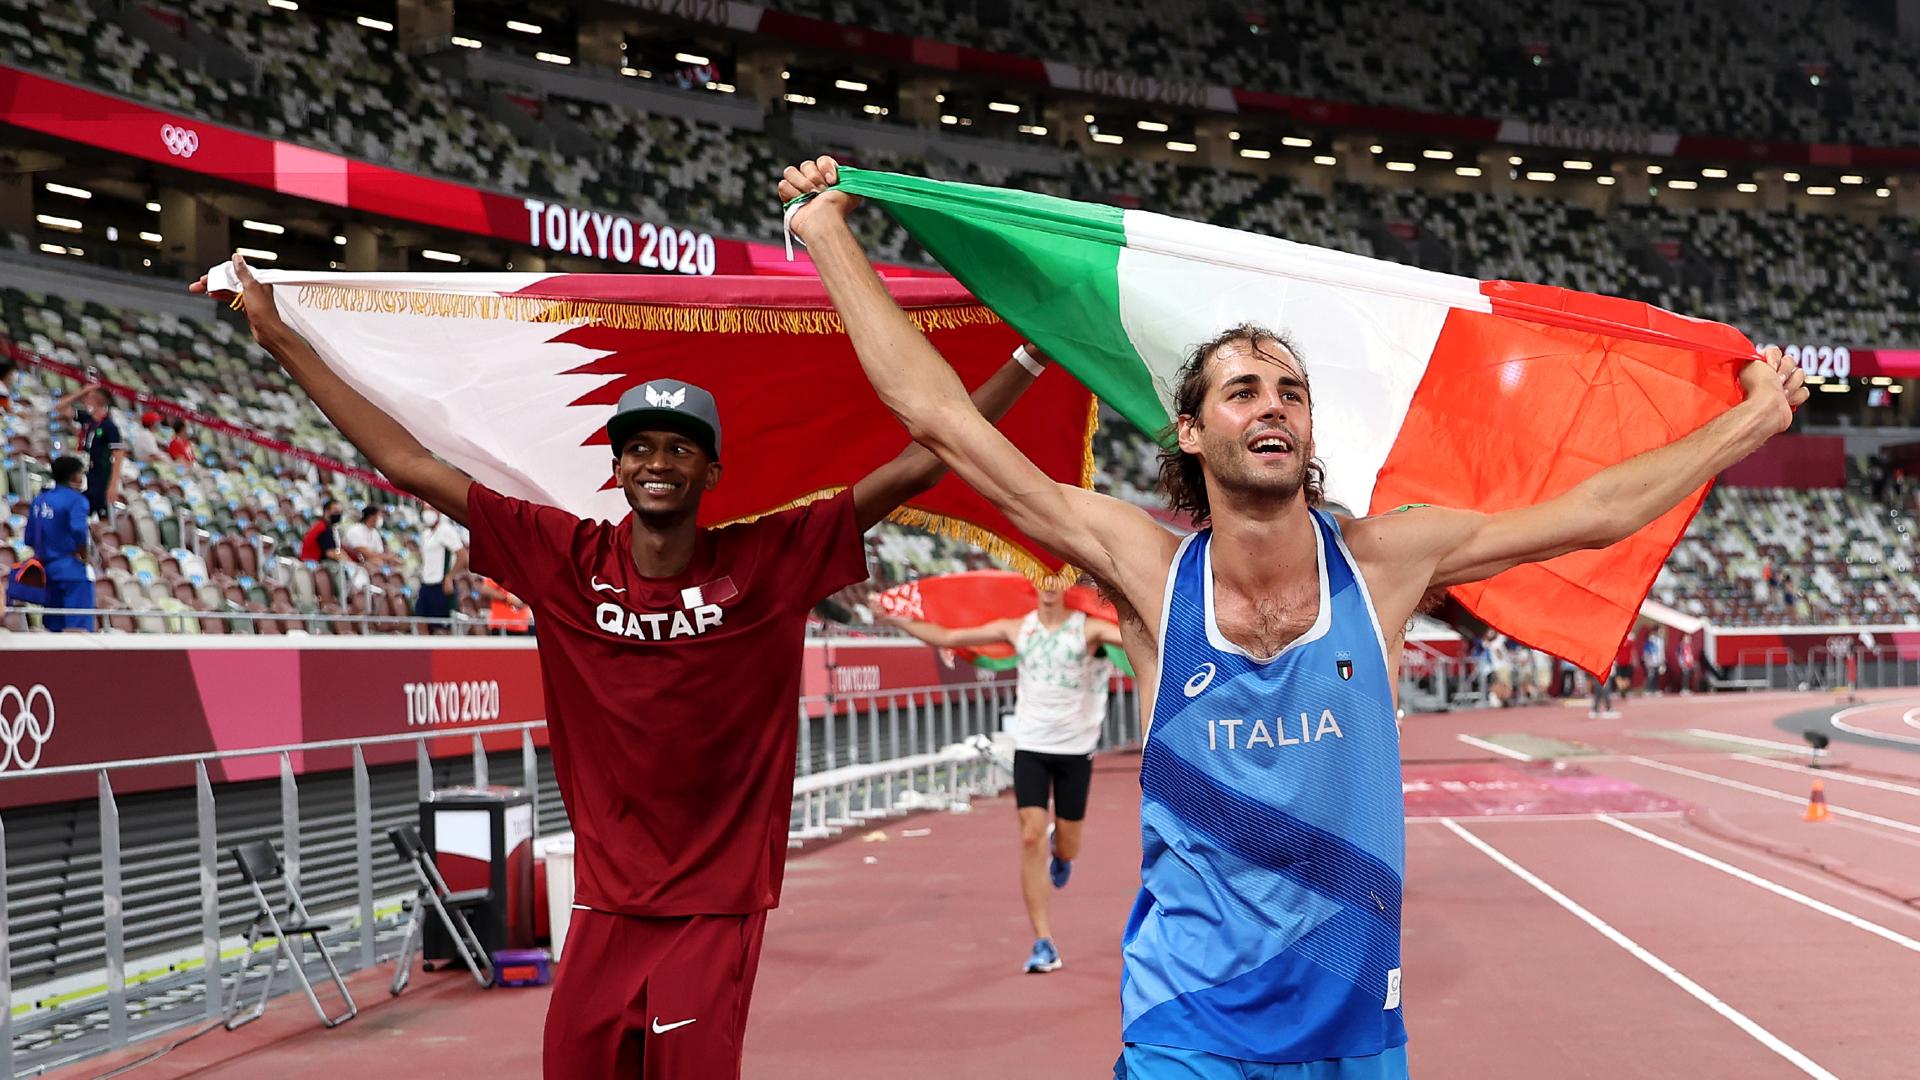 Qatar's Mutaz Esha Barshem, Italy's Gianmarco Tamberi share Olympic gold in  men's high jump   Sporting News